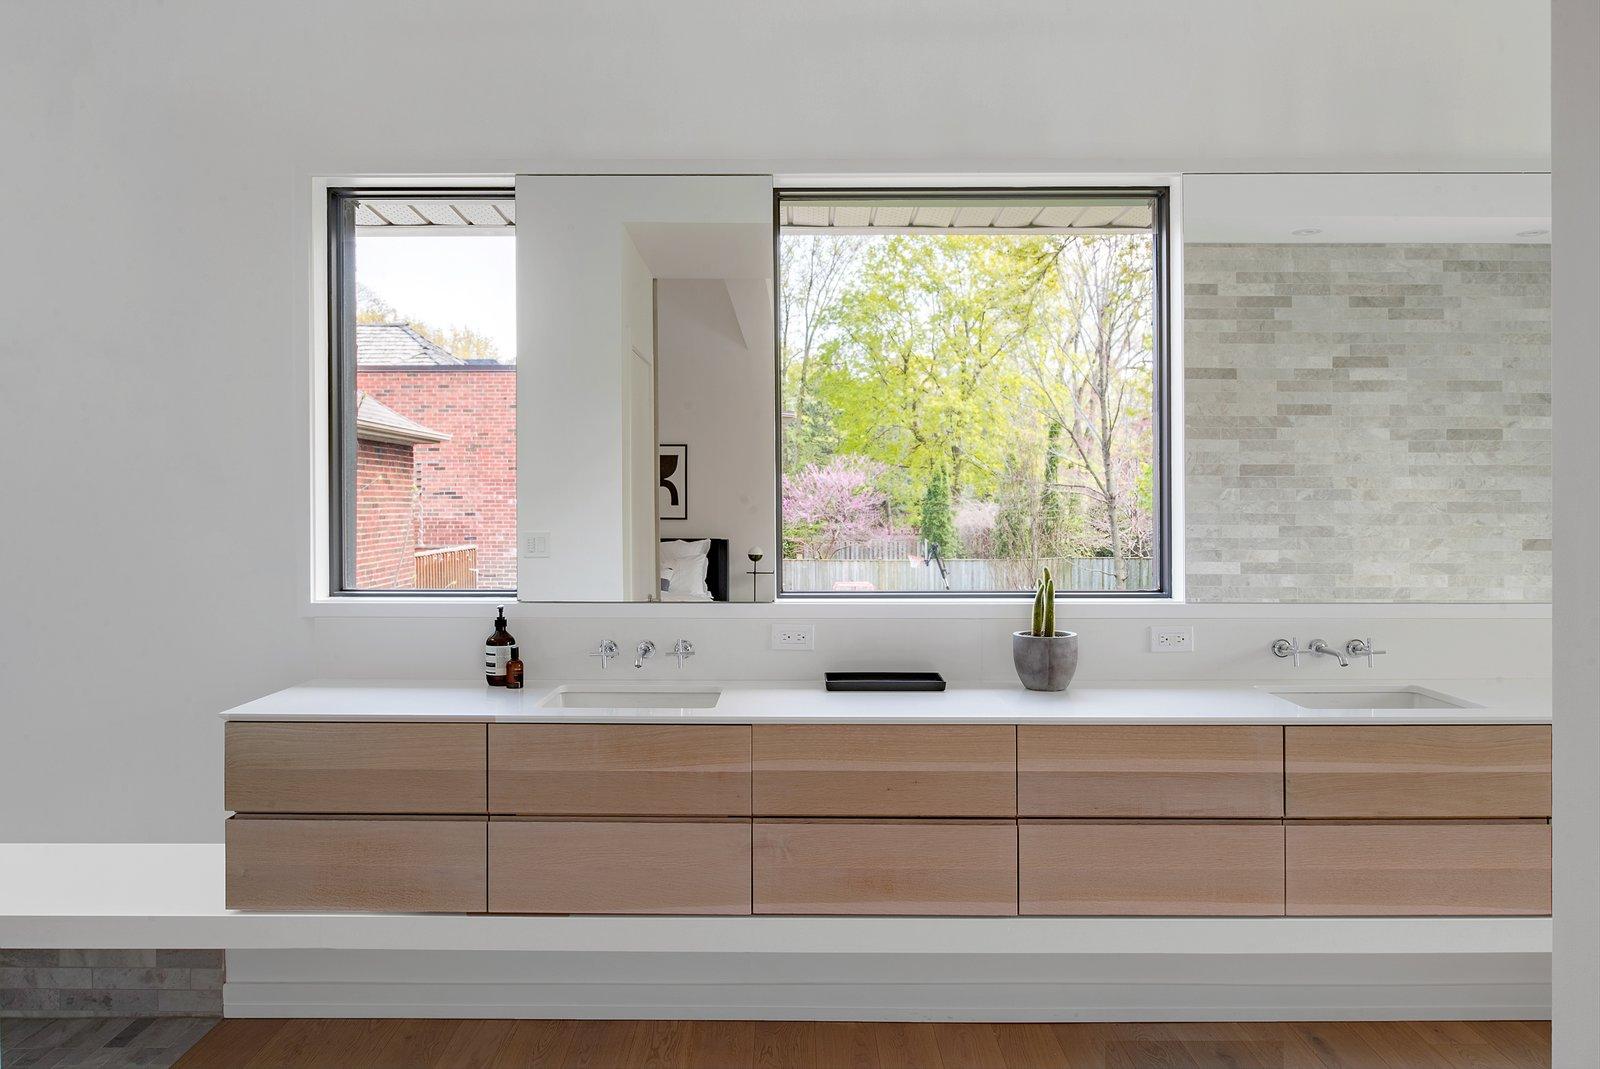 Bath Room, Engineered Quartz Counter, Light Hardwood Floor, Undermount Sink, Freestanding Tub, Open Shower, and Ceiling Lighting  Richview Residence